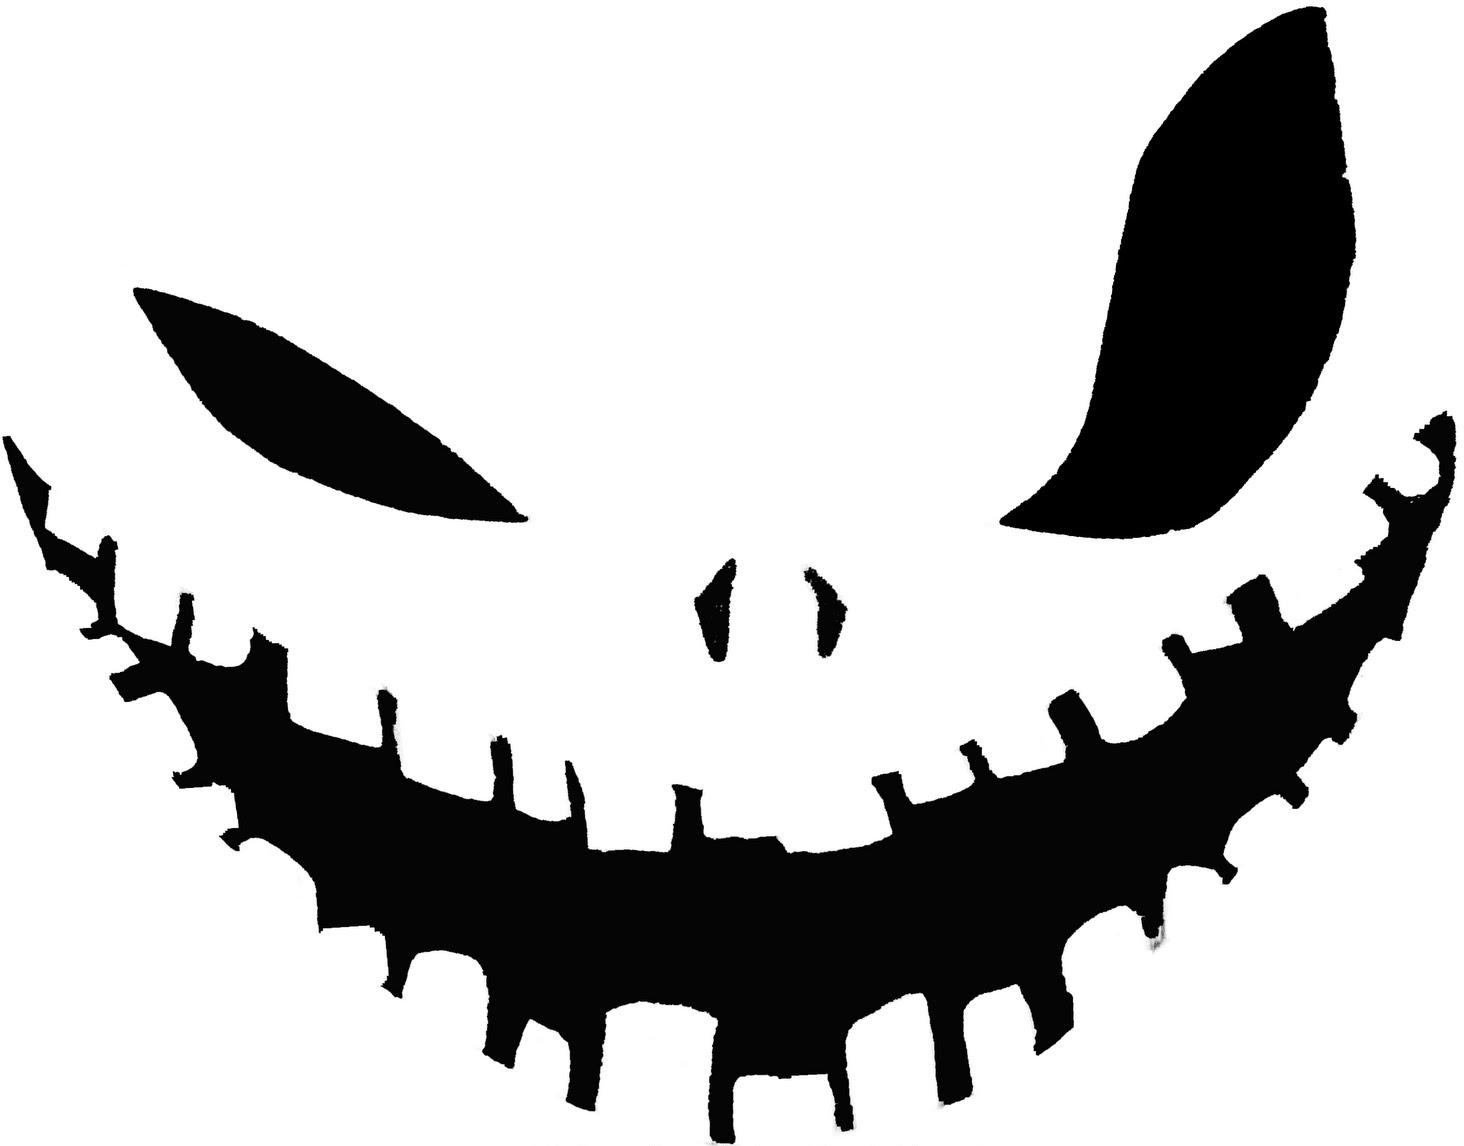 Jackolantern faces clipart clip transparent stock Jackolantern Mouth | Free download best Jackolantern Mouth ... clip transparent stock